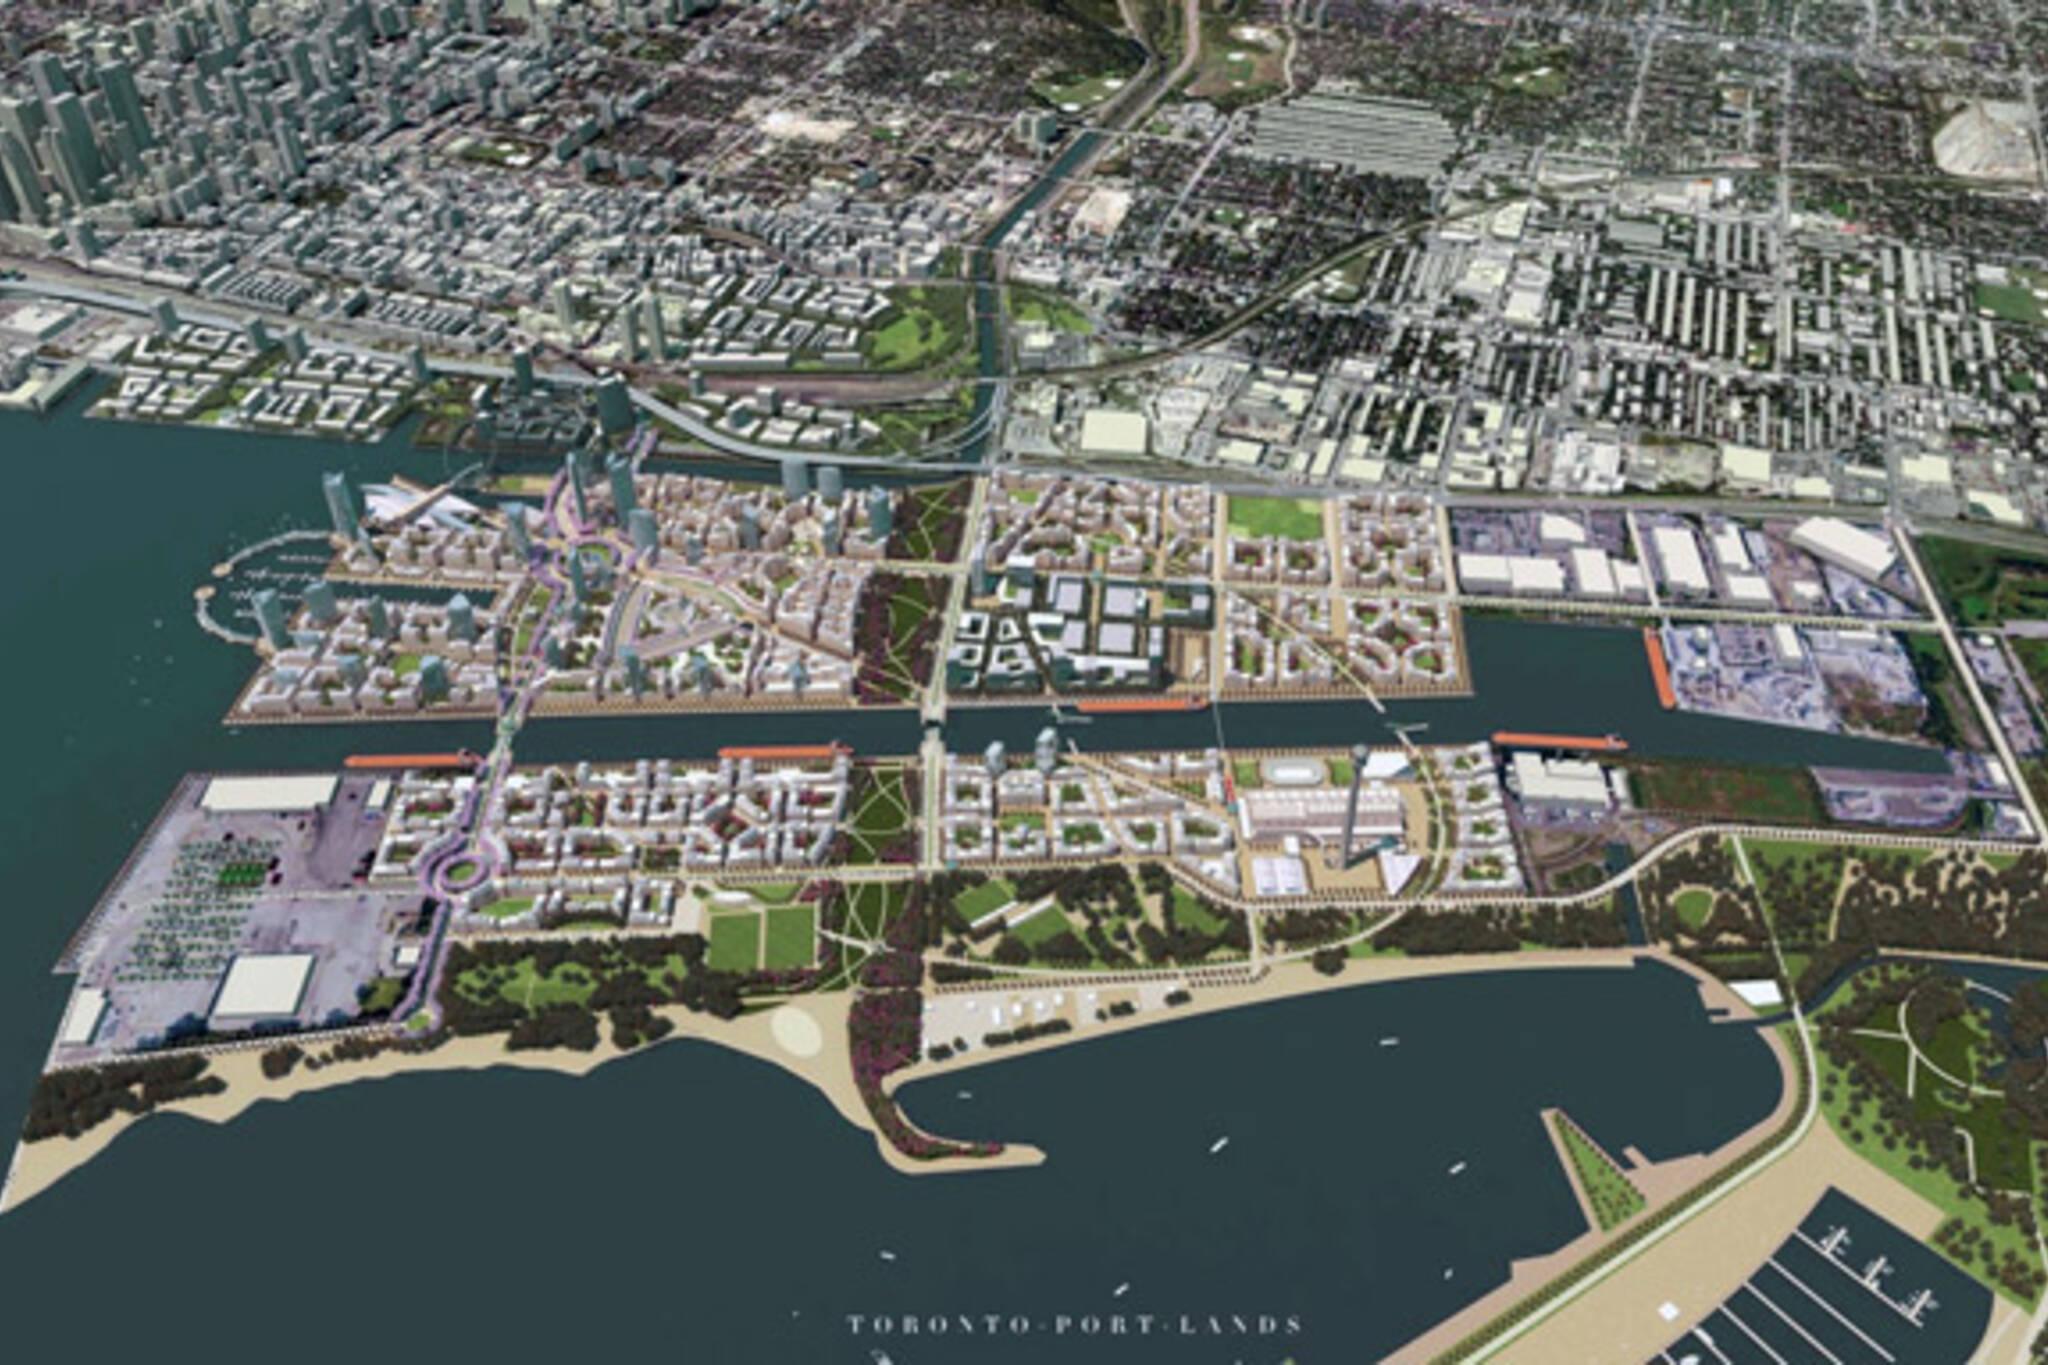 Toronto Port Lands vision Doug Rob Ford